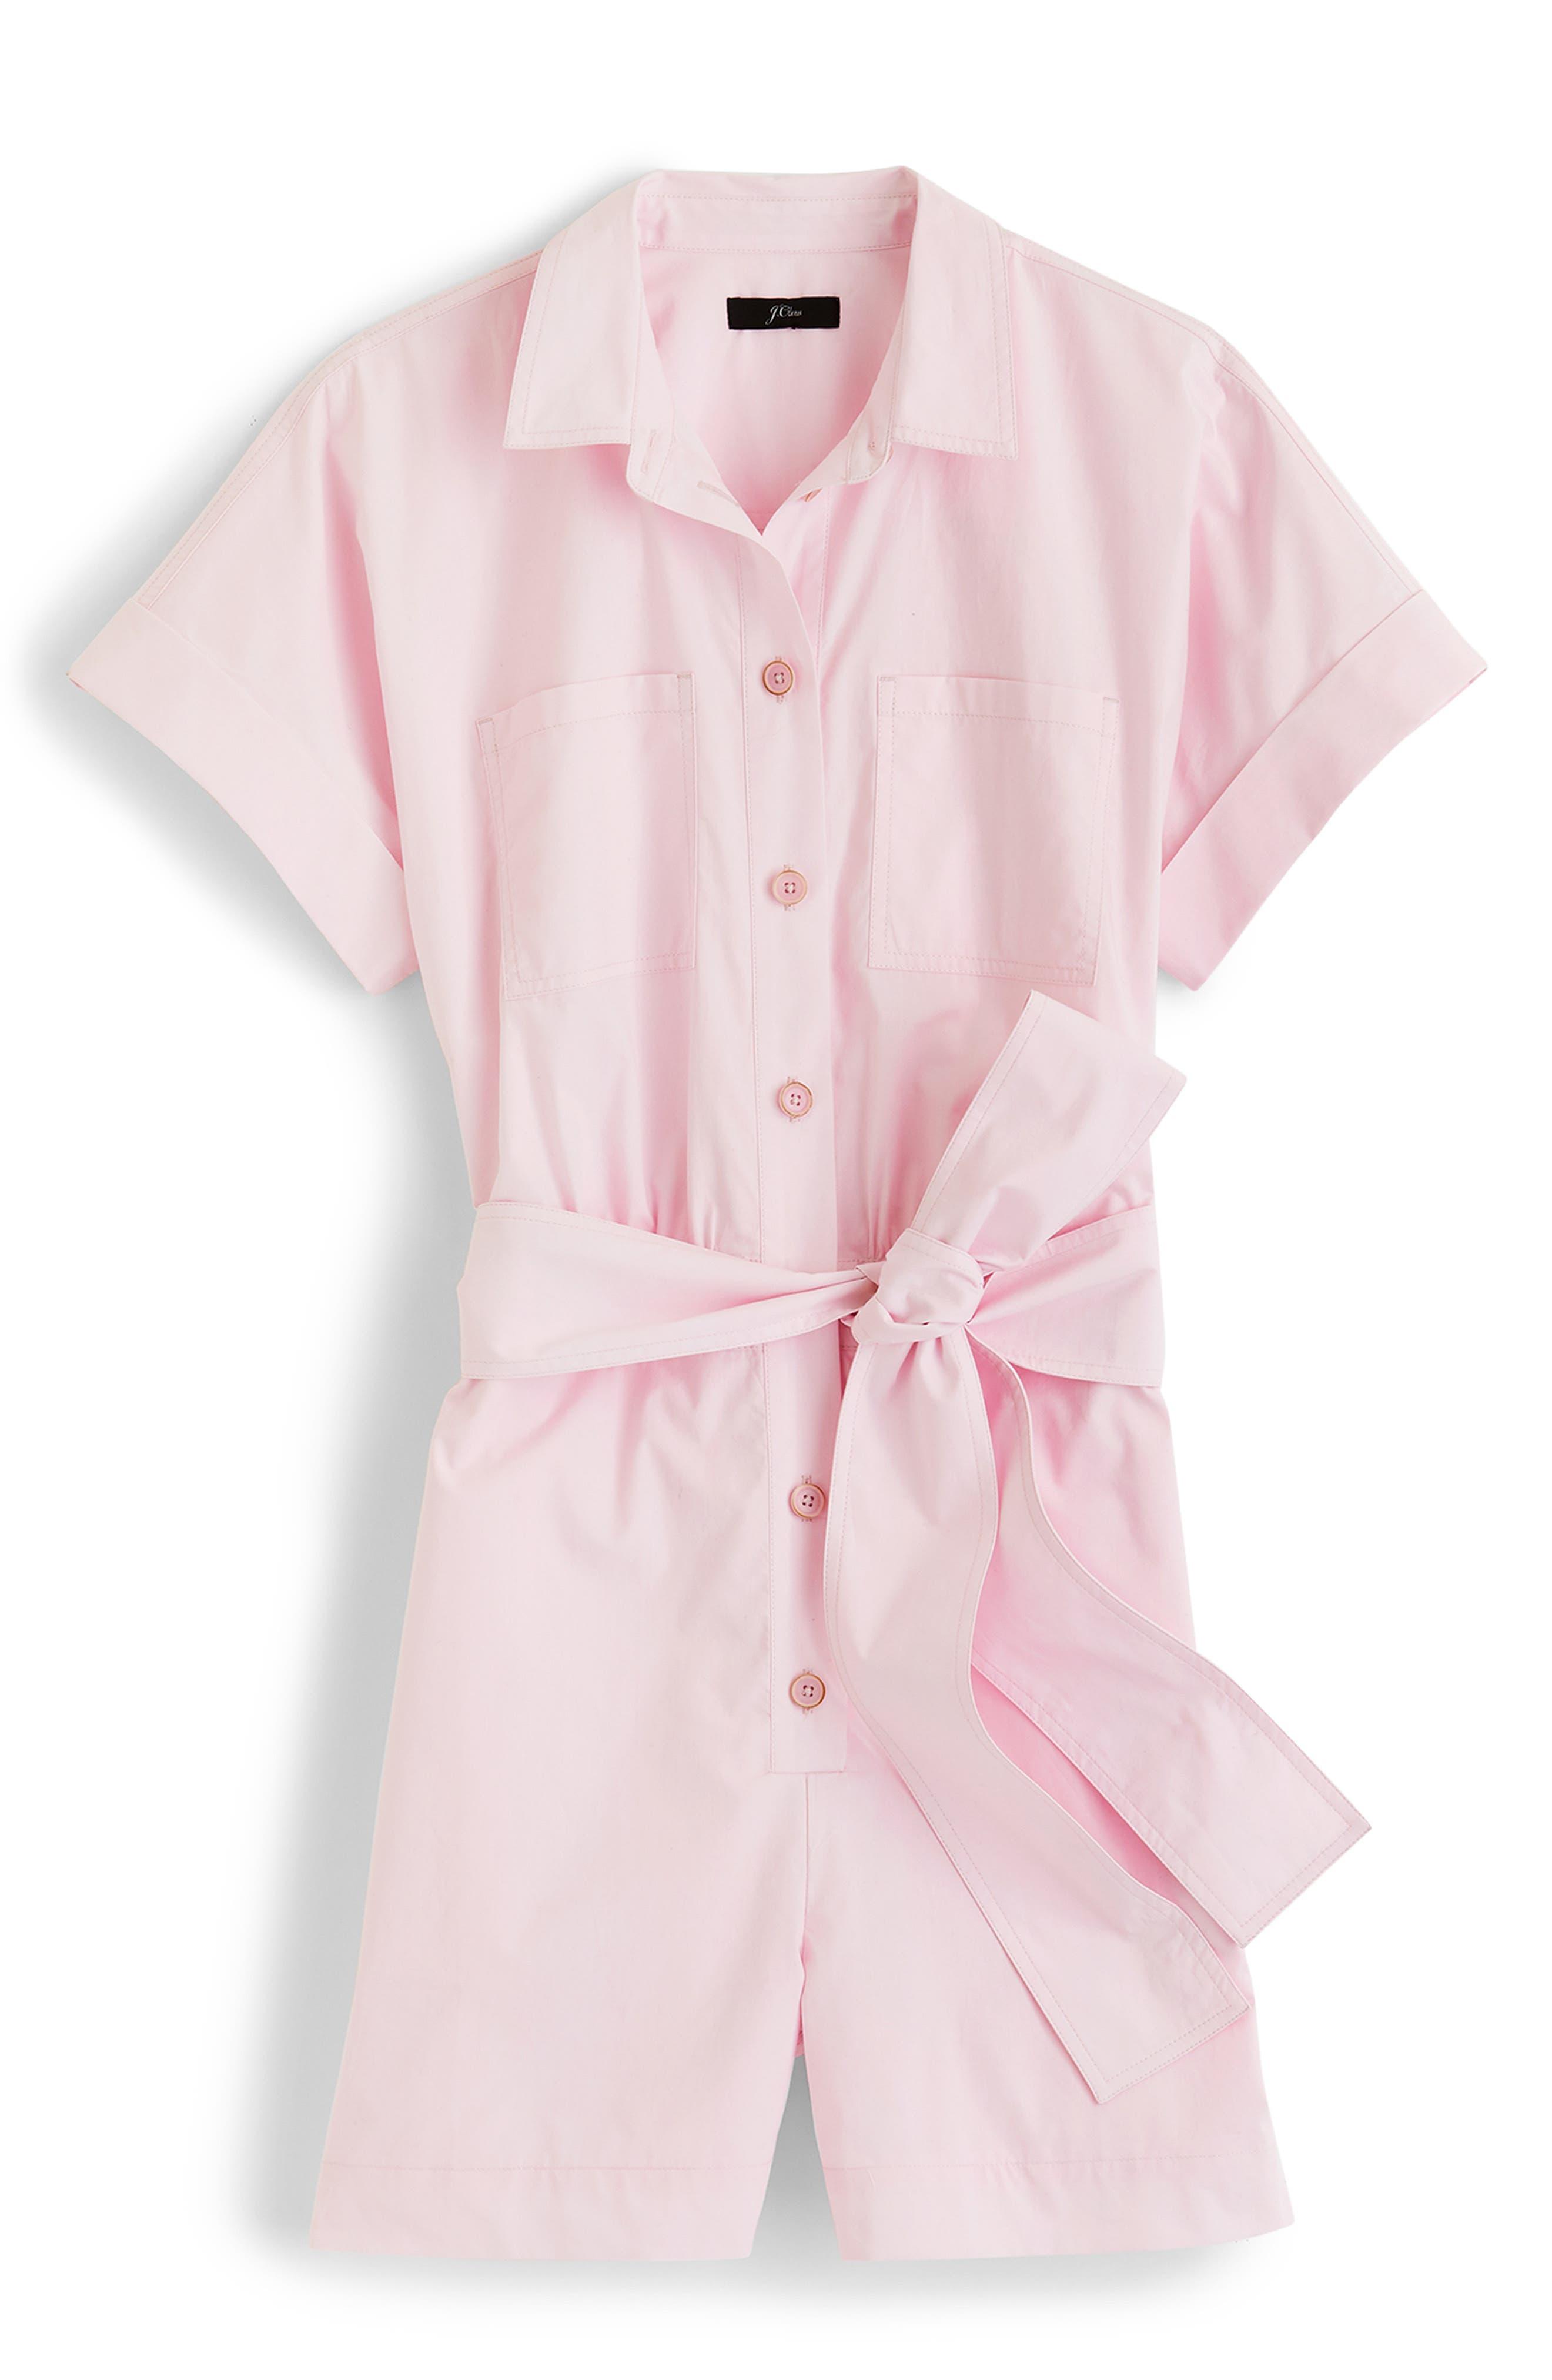 J.crew Button-Up Short Romper, Pink